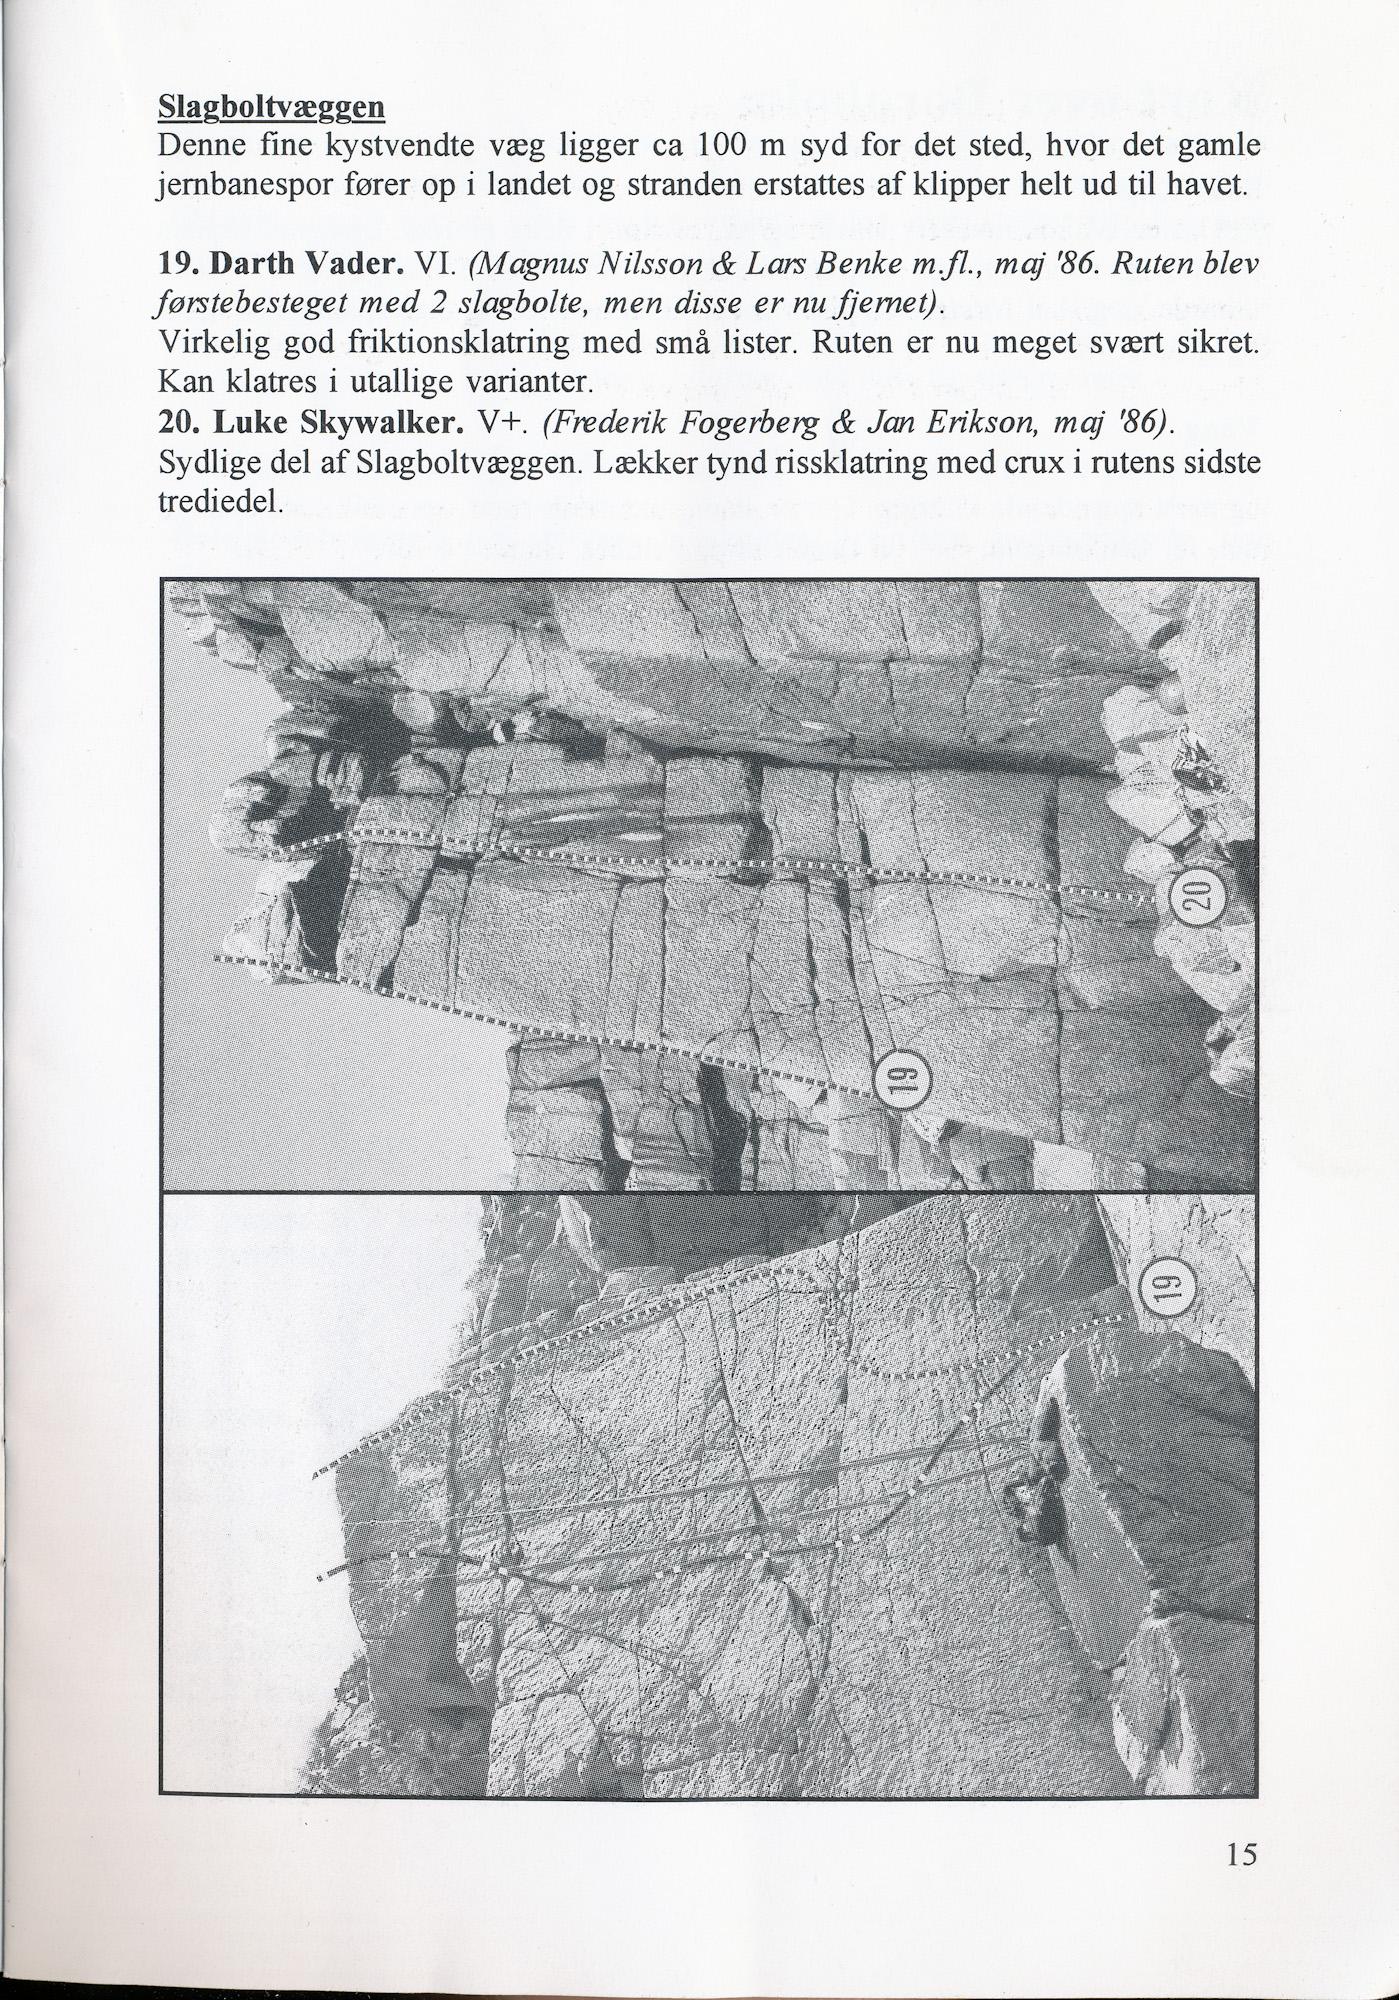 50 udvalgte ruter paa bornholm 1995 15.jpg